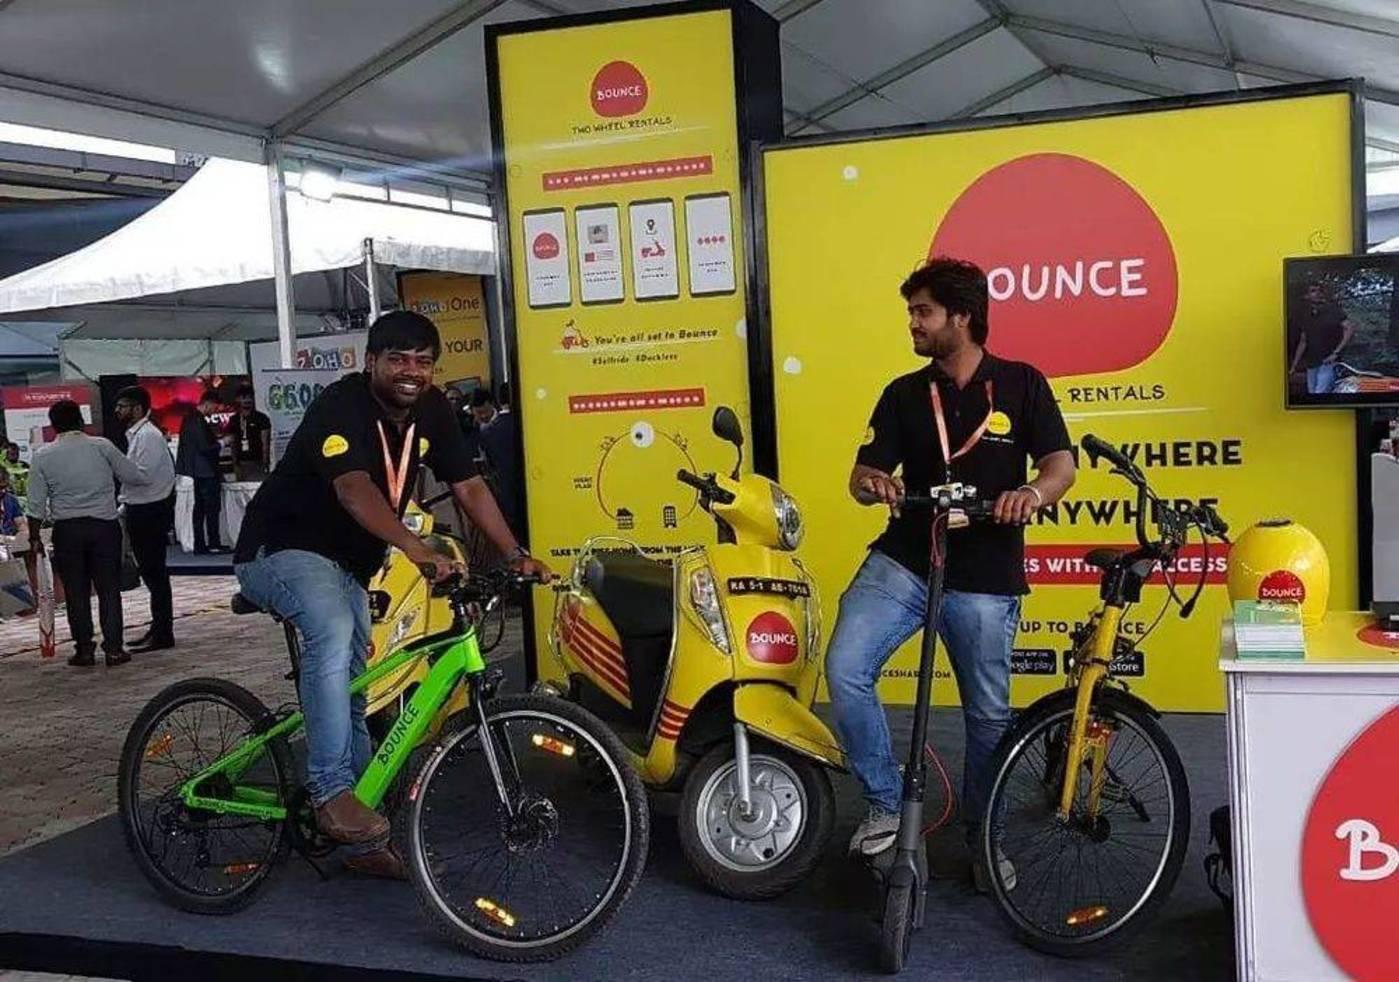 ofo退出印度后,单车被共享踏板车公司Bounce回收